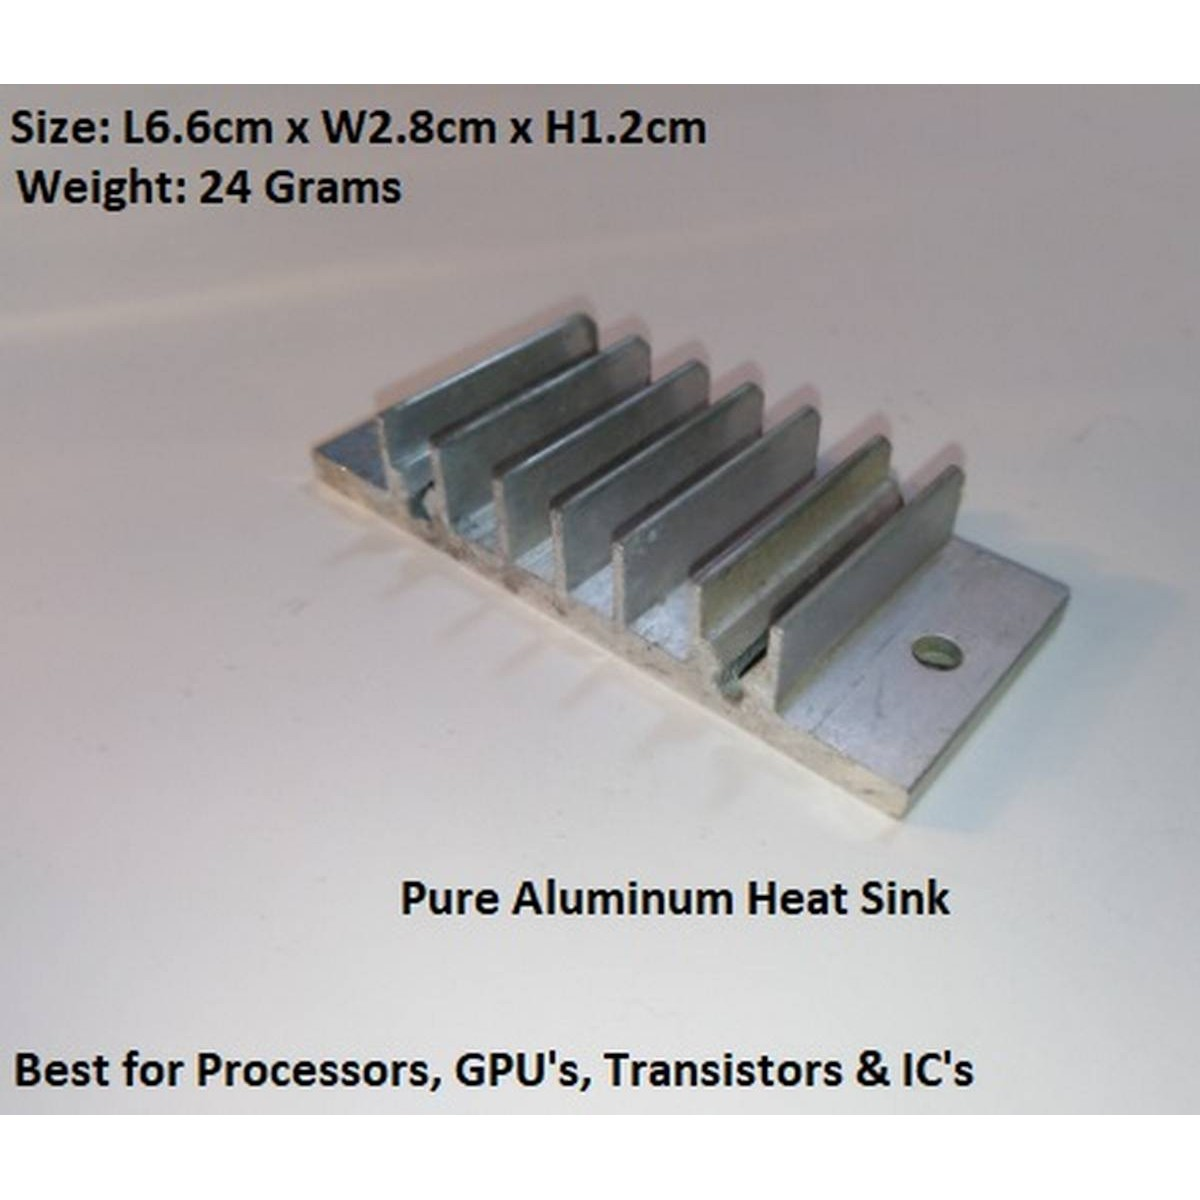 High Quality Pure Aluminum Heat Sink Cooler Cooling fin - Heatsink for Peltier, IC, LED's Transistor, RAM - Size: L6.6cm x W2.8cm x H1.2cm